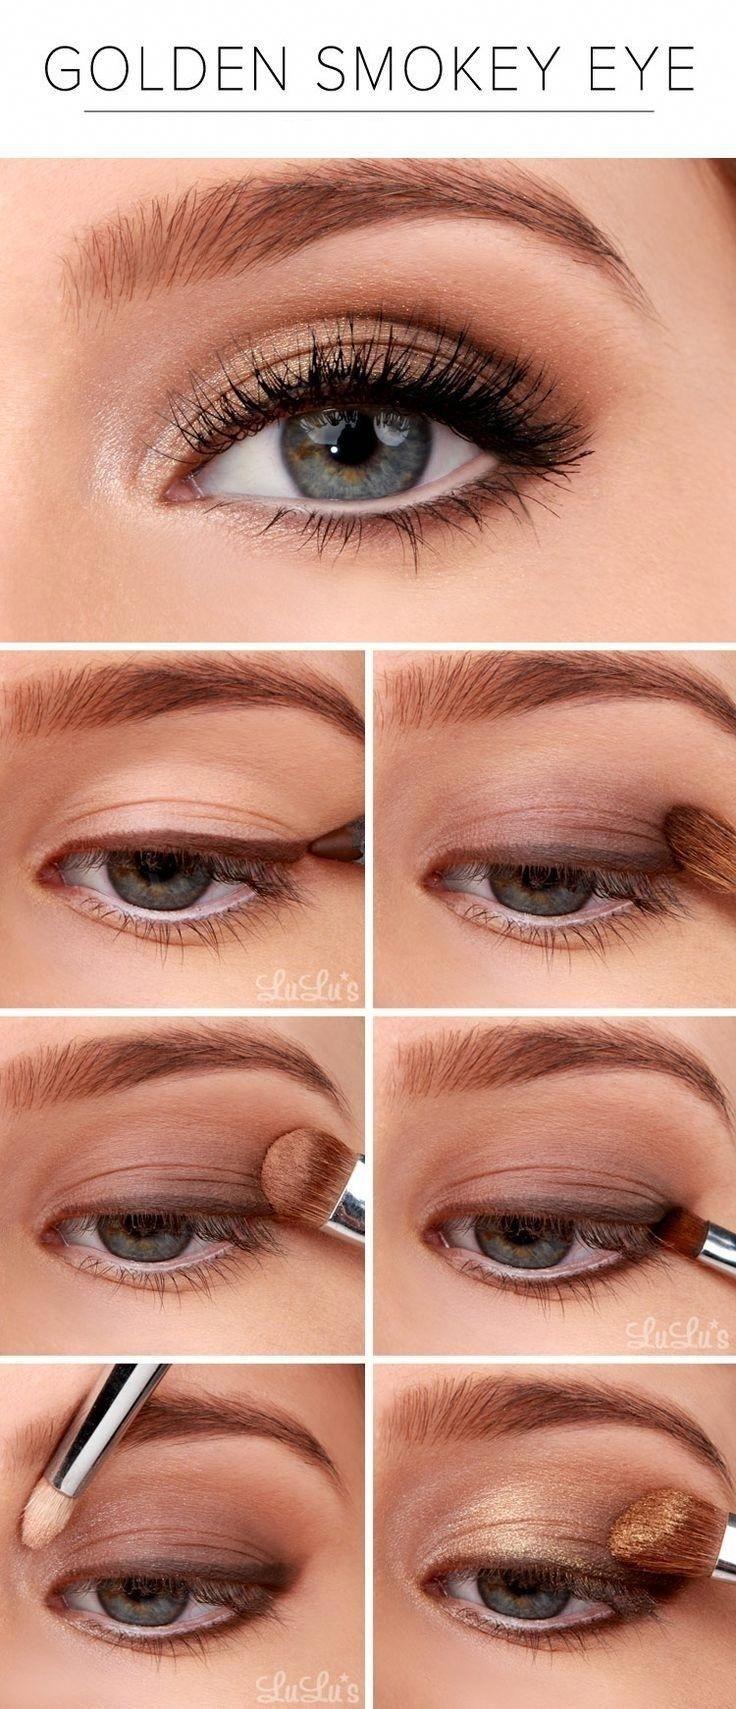 "Golden Smokey Eyes "" 10 Eye Makeup Ideas (9) "" #smokeyeyemakeup within Smokey Eye Makeup Ideas Pinterest"